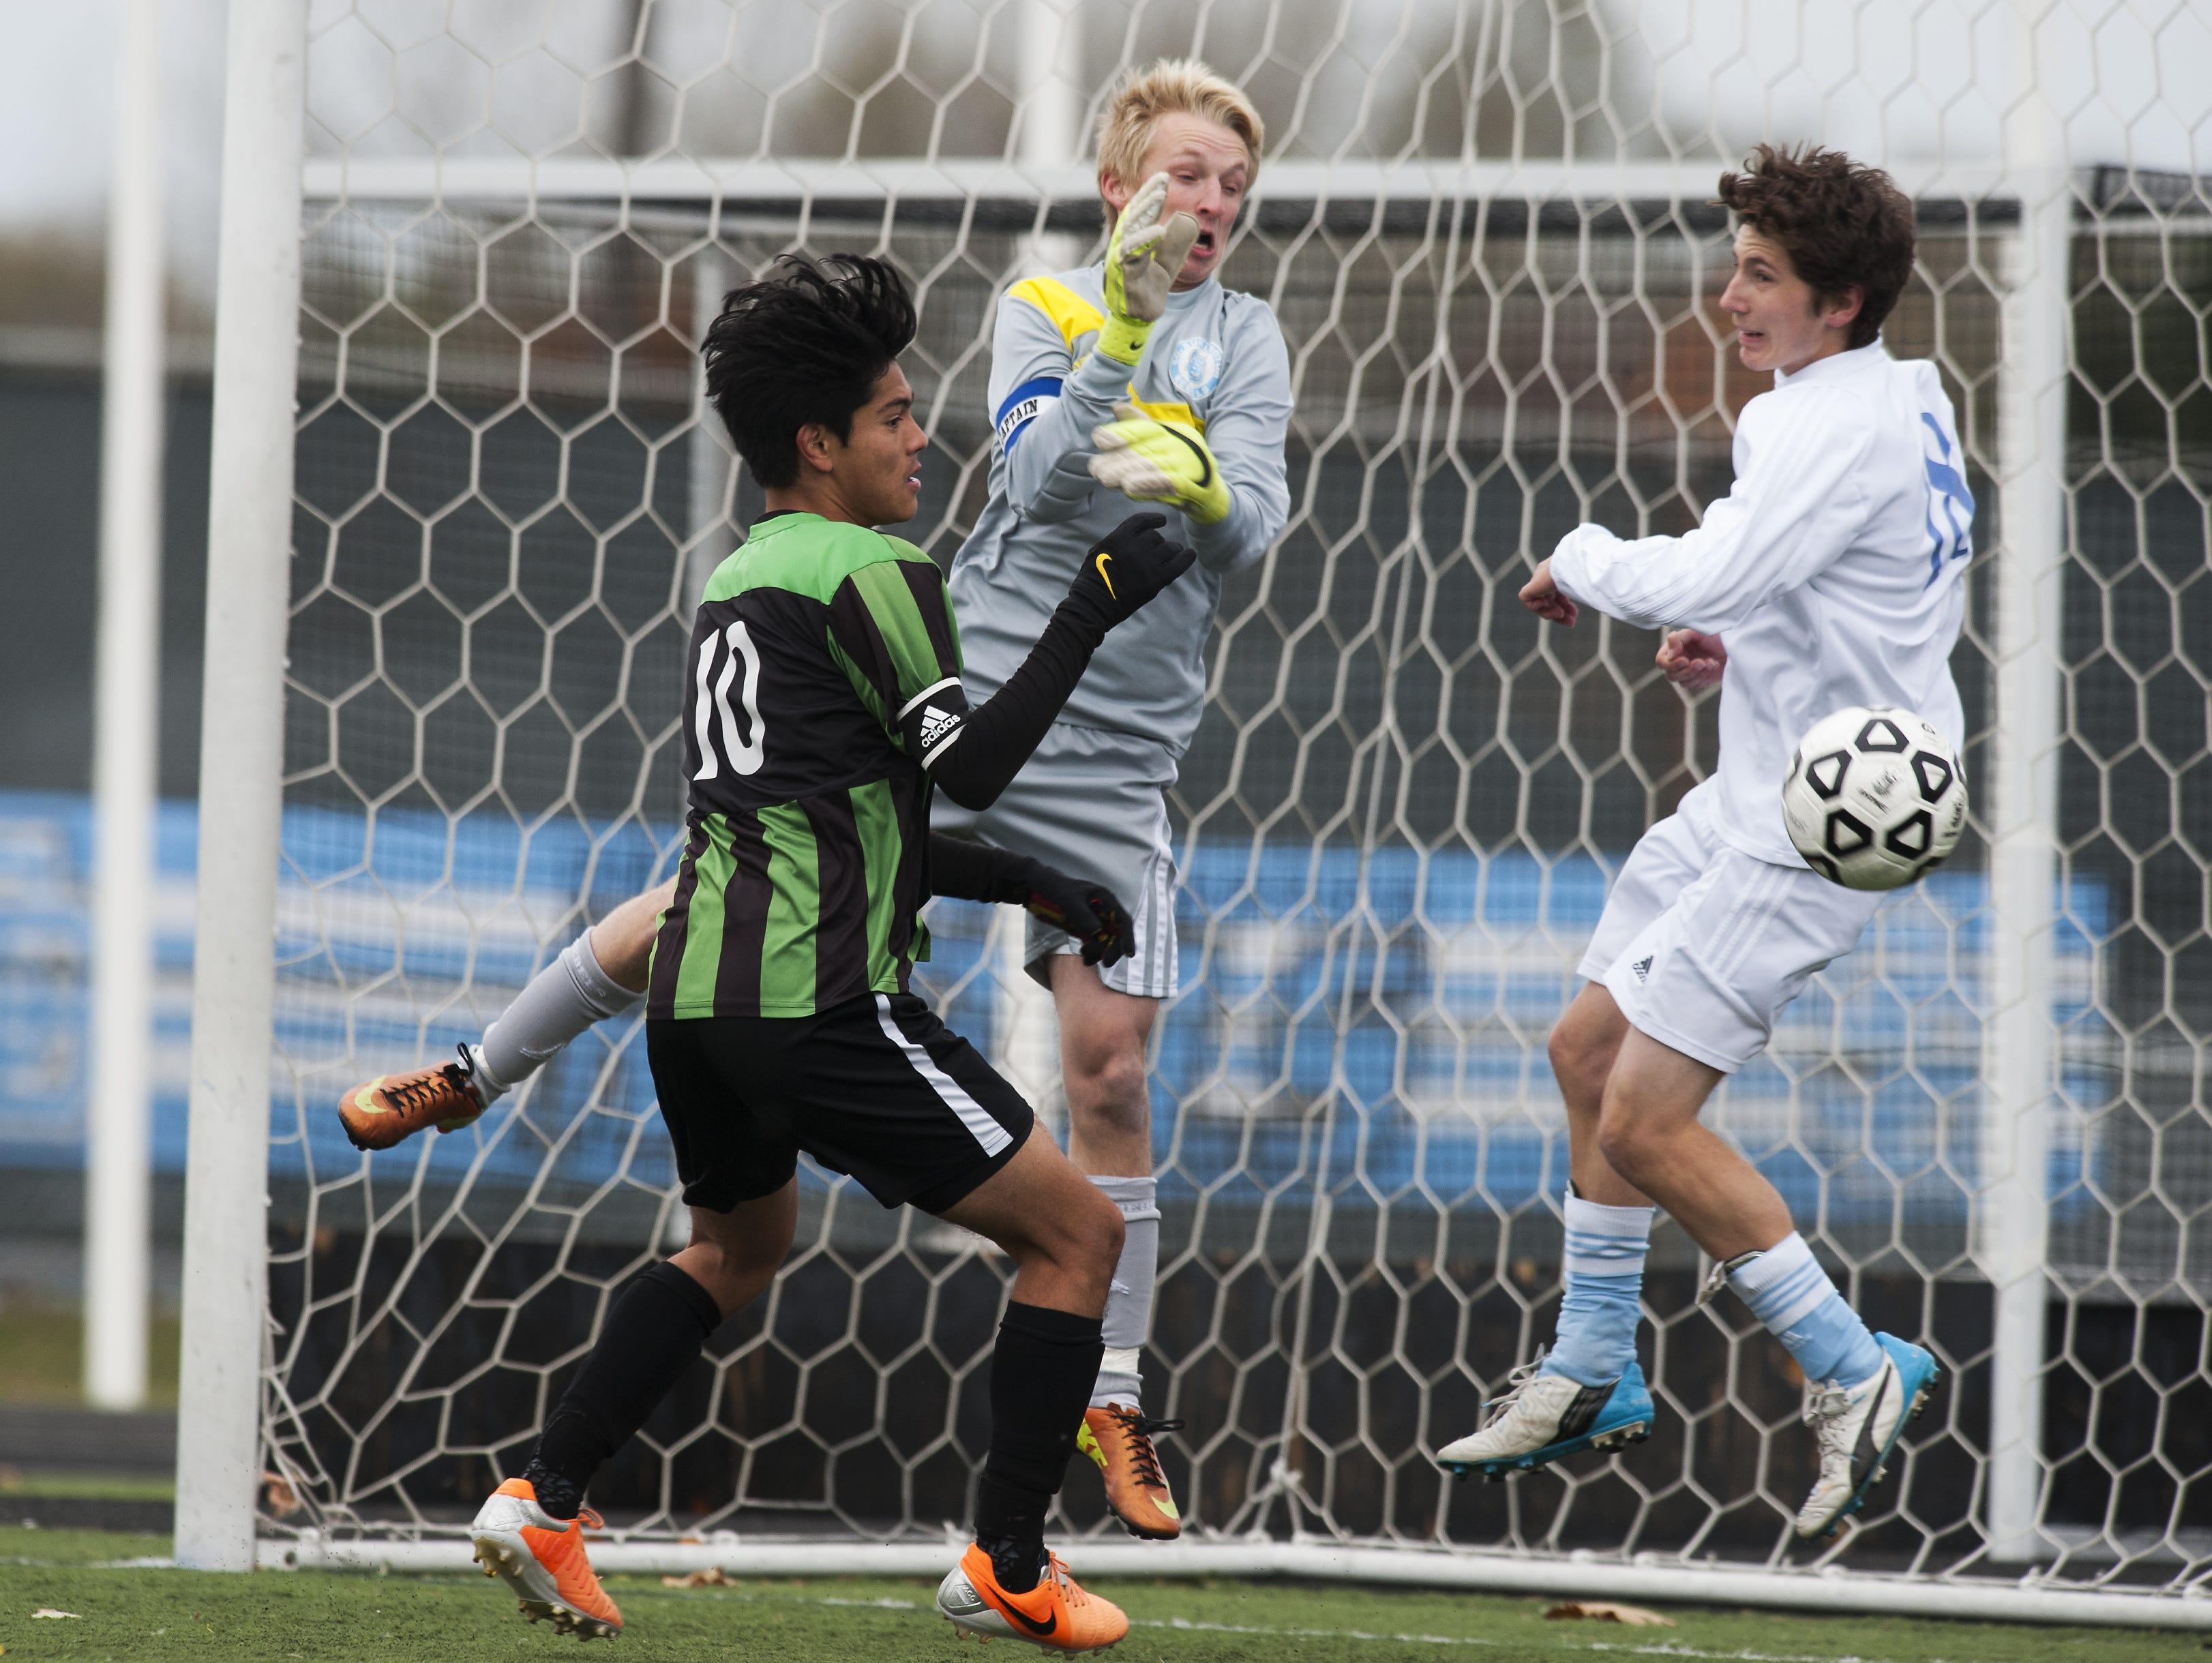 South Burlington goalie Tyler Ayers (0) makes a save during a Division I high school boys soccer quarterfinal Saturday.